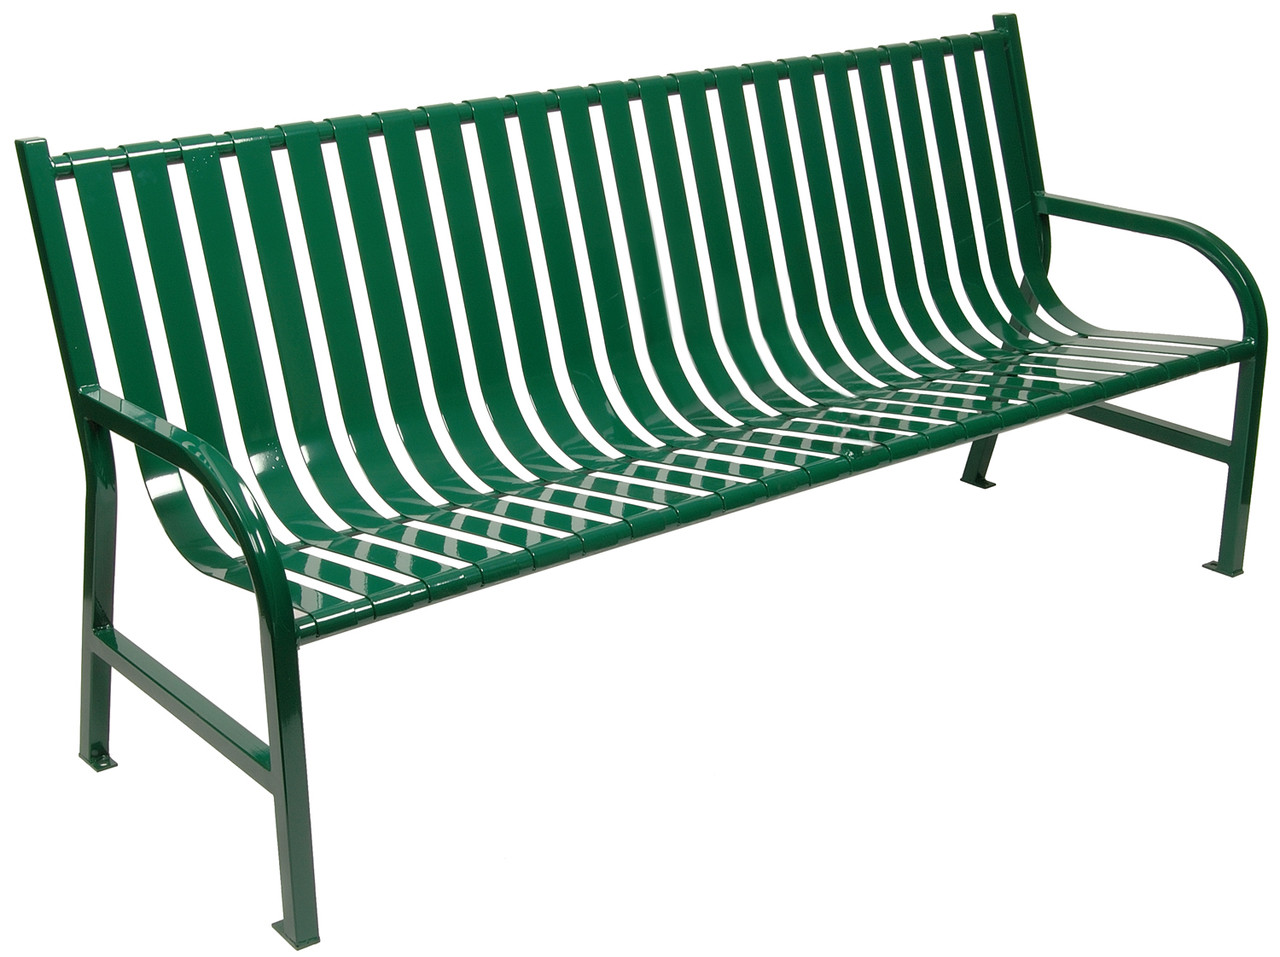 Witt Industries Oakley Outdoor Slatted Bench 6 Foot Green